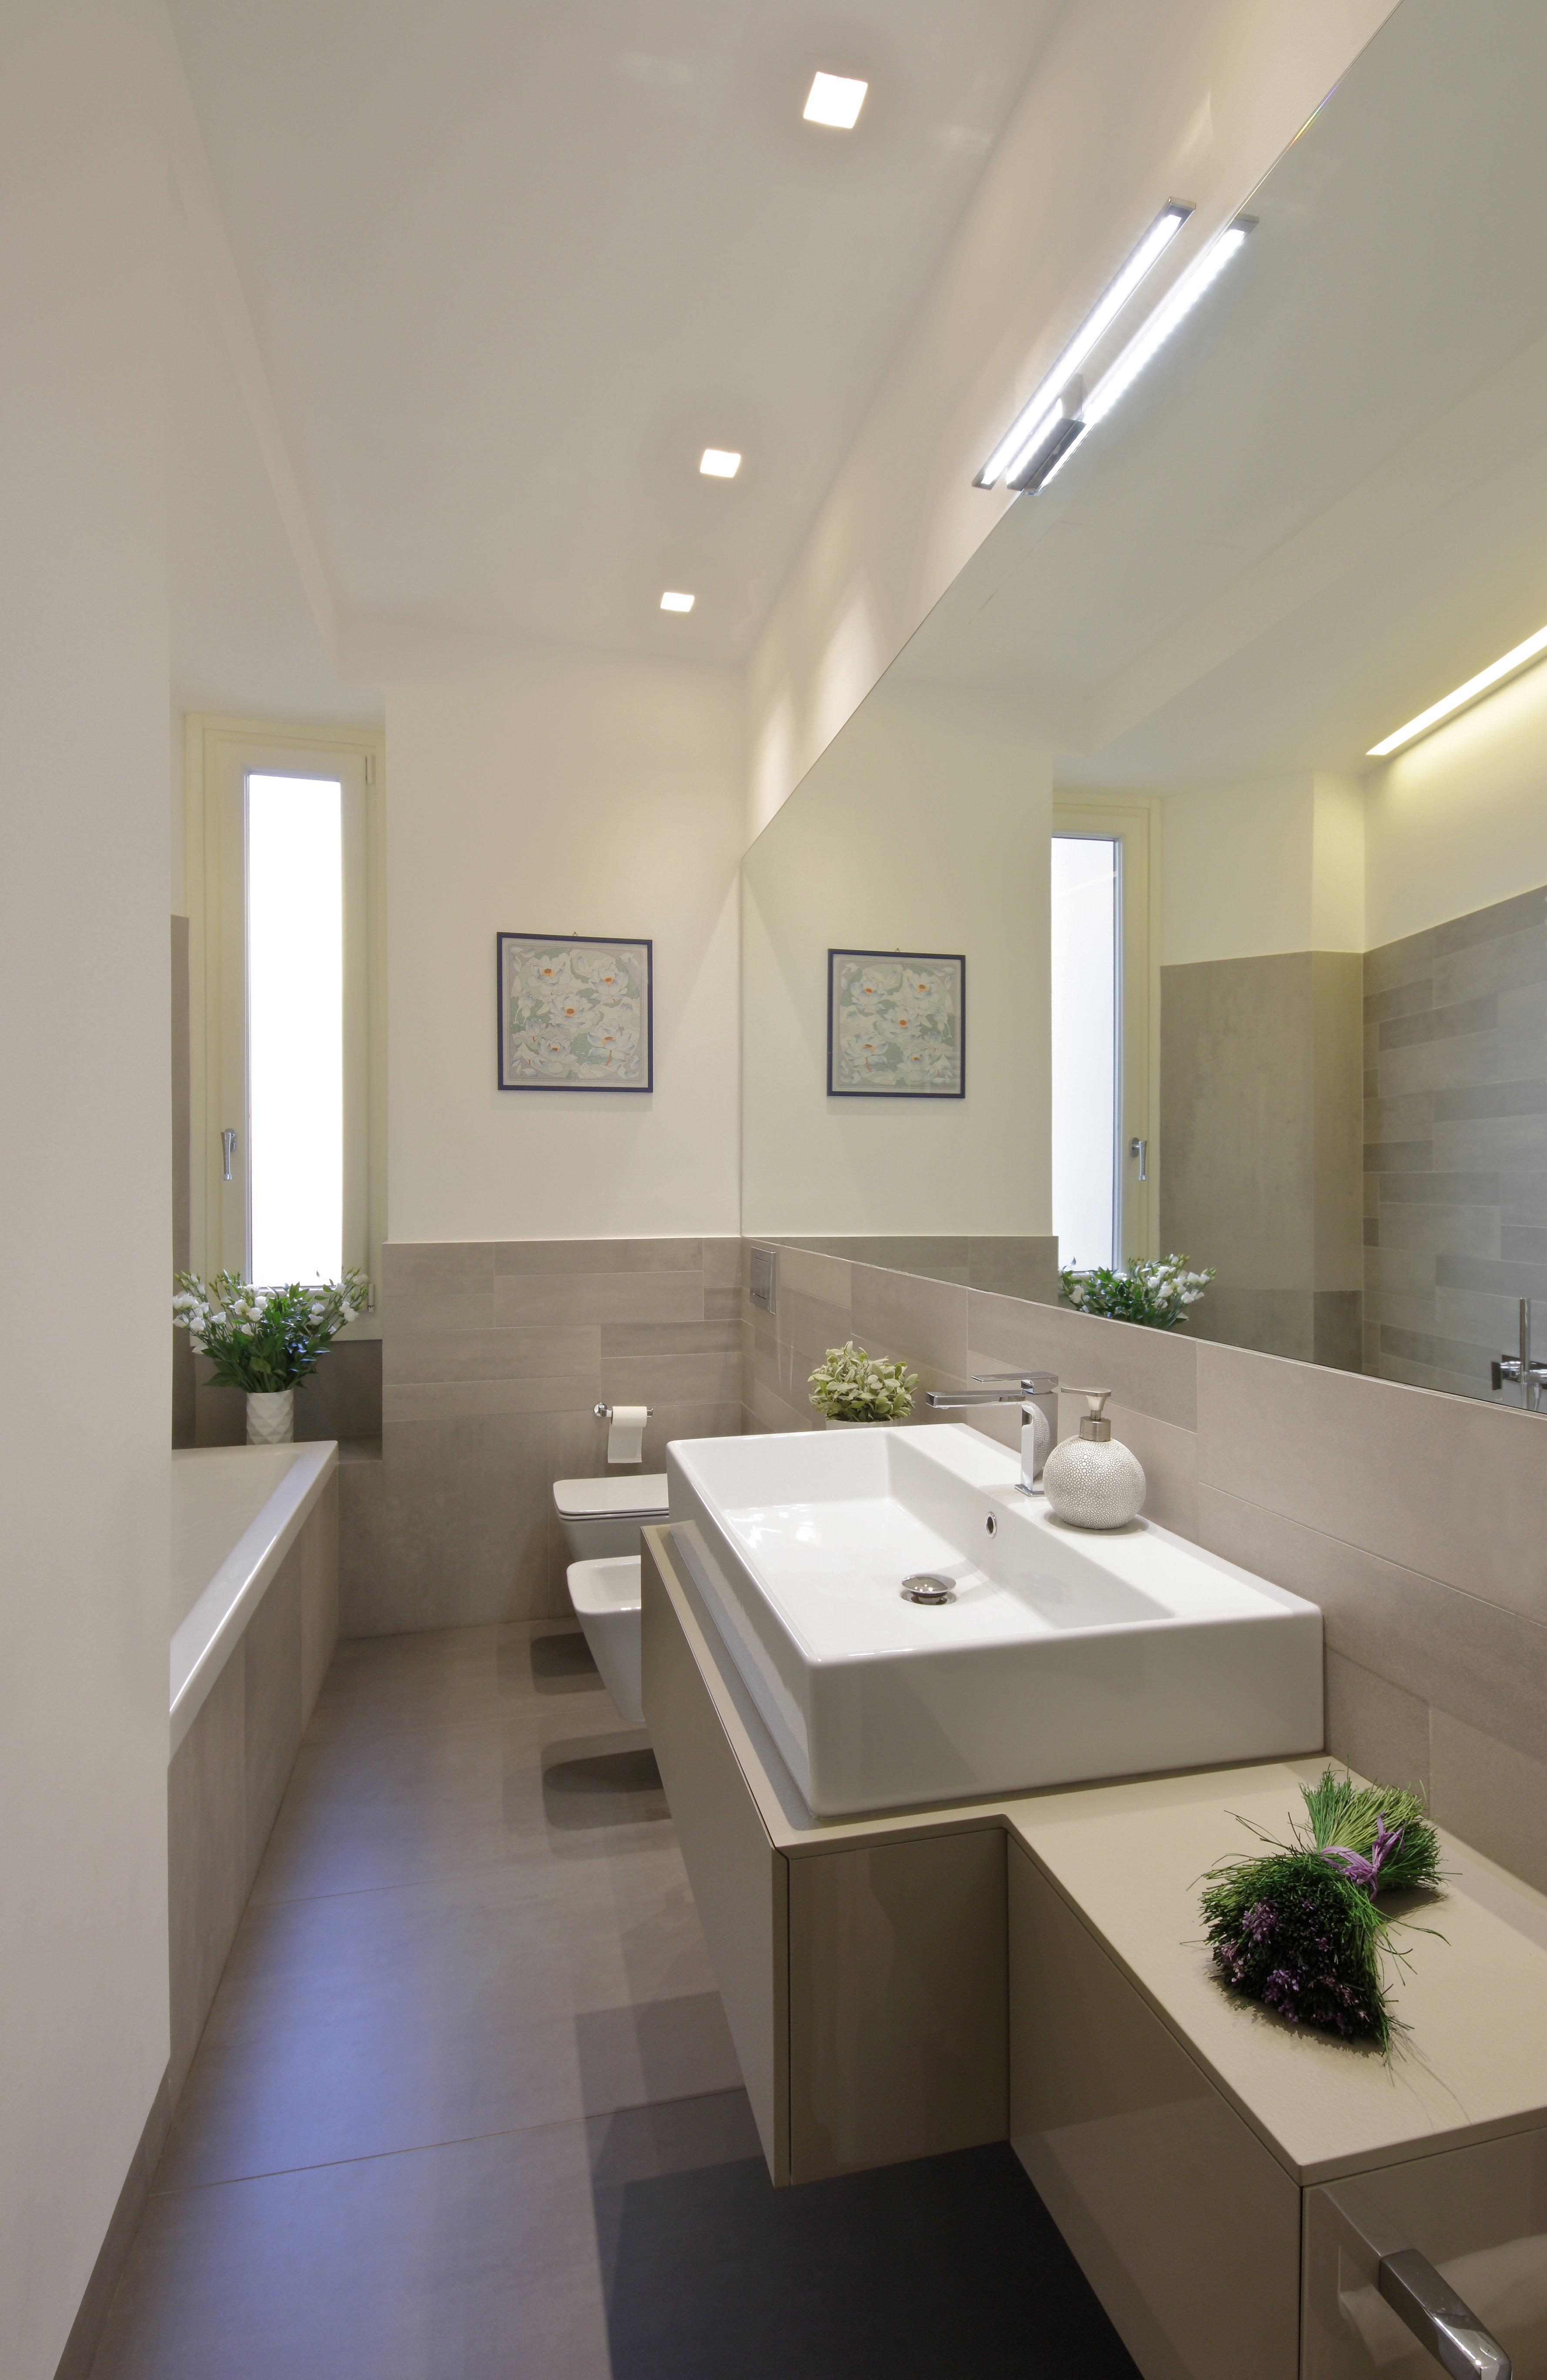 100 mq una casa a pianta irregolare ben risolta cose di casa - Termoarredo per bagno 6 mq ...